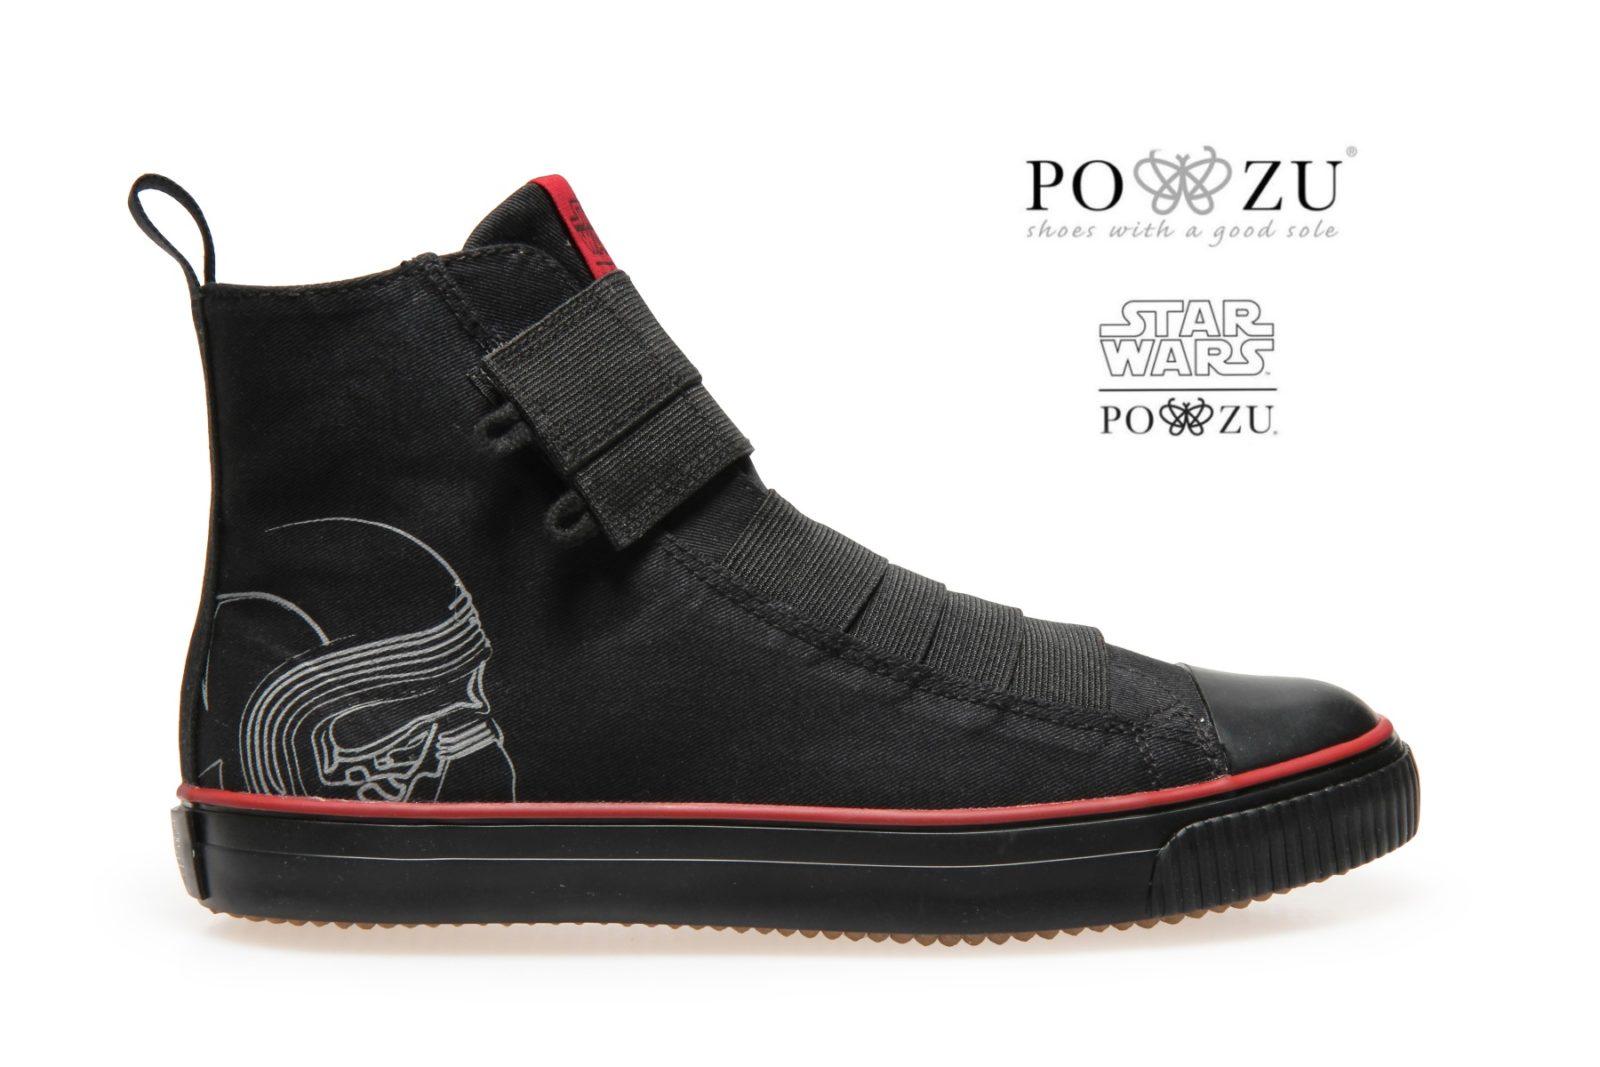 New Po-Zu x Star Wars Kylo Ren Sneakers!